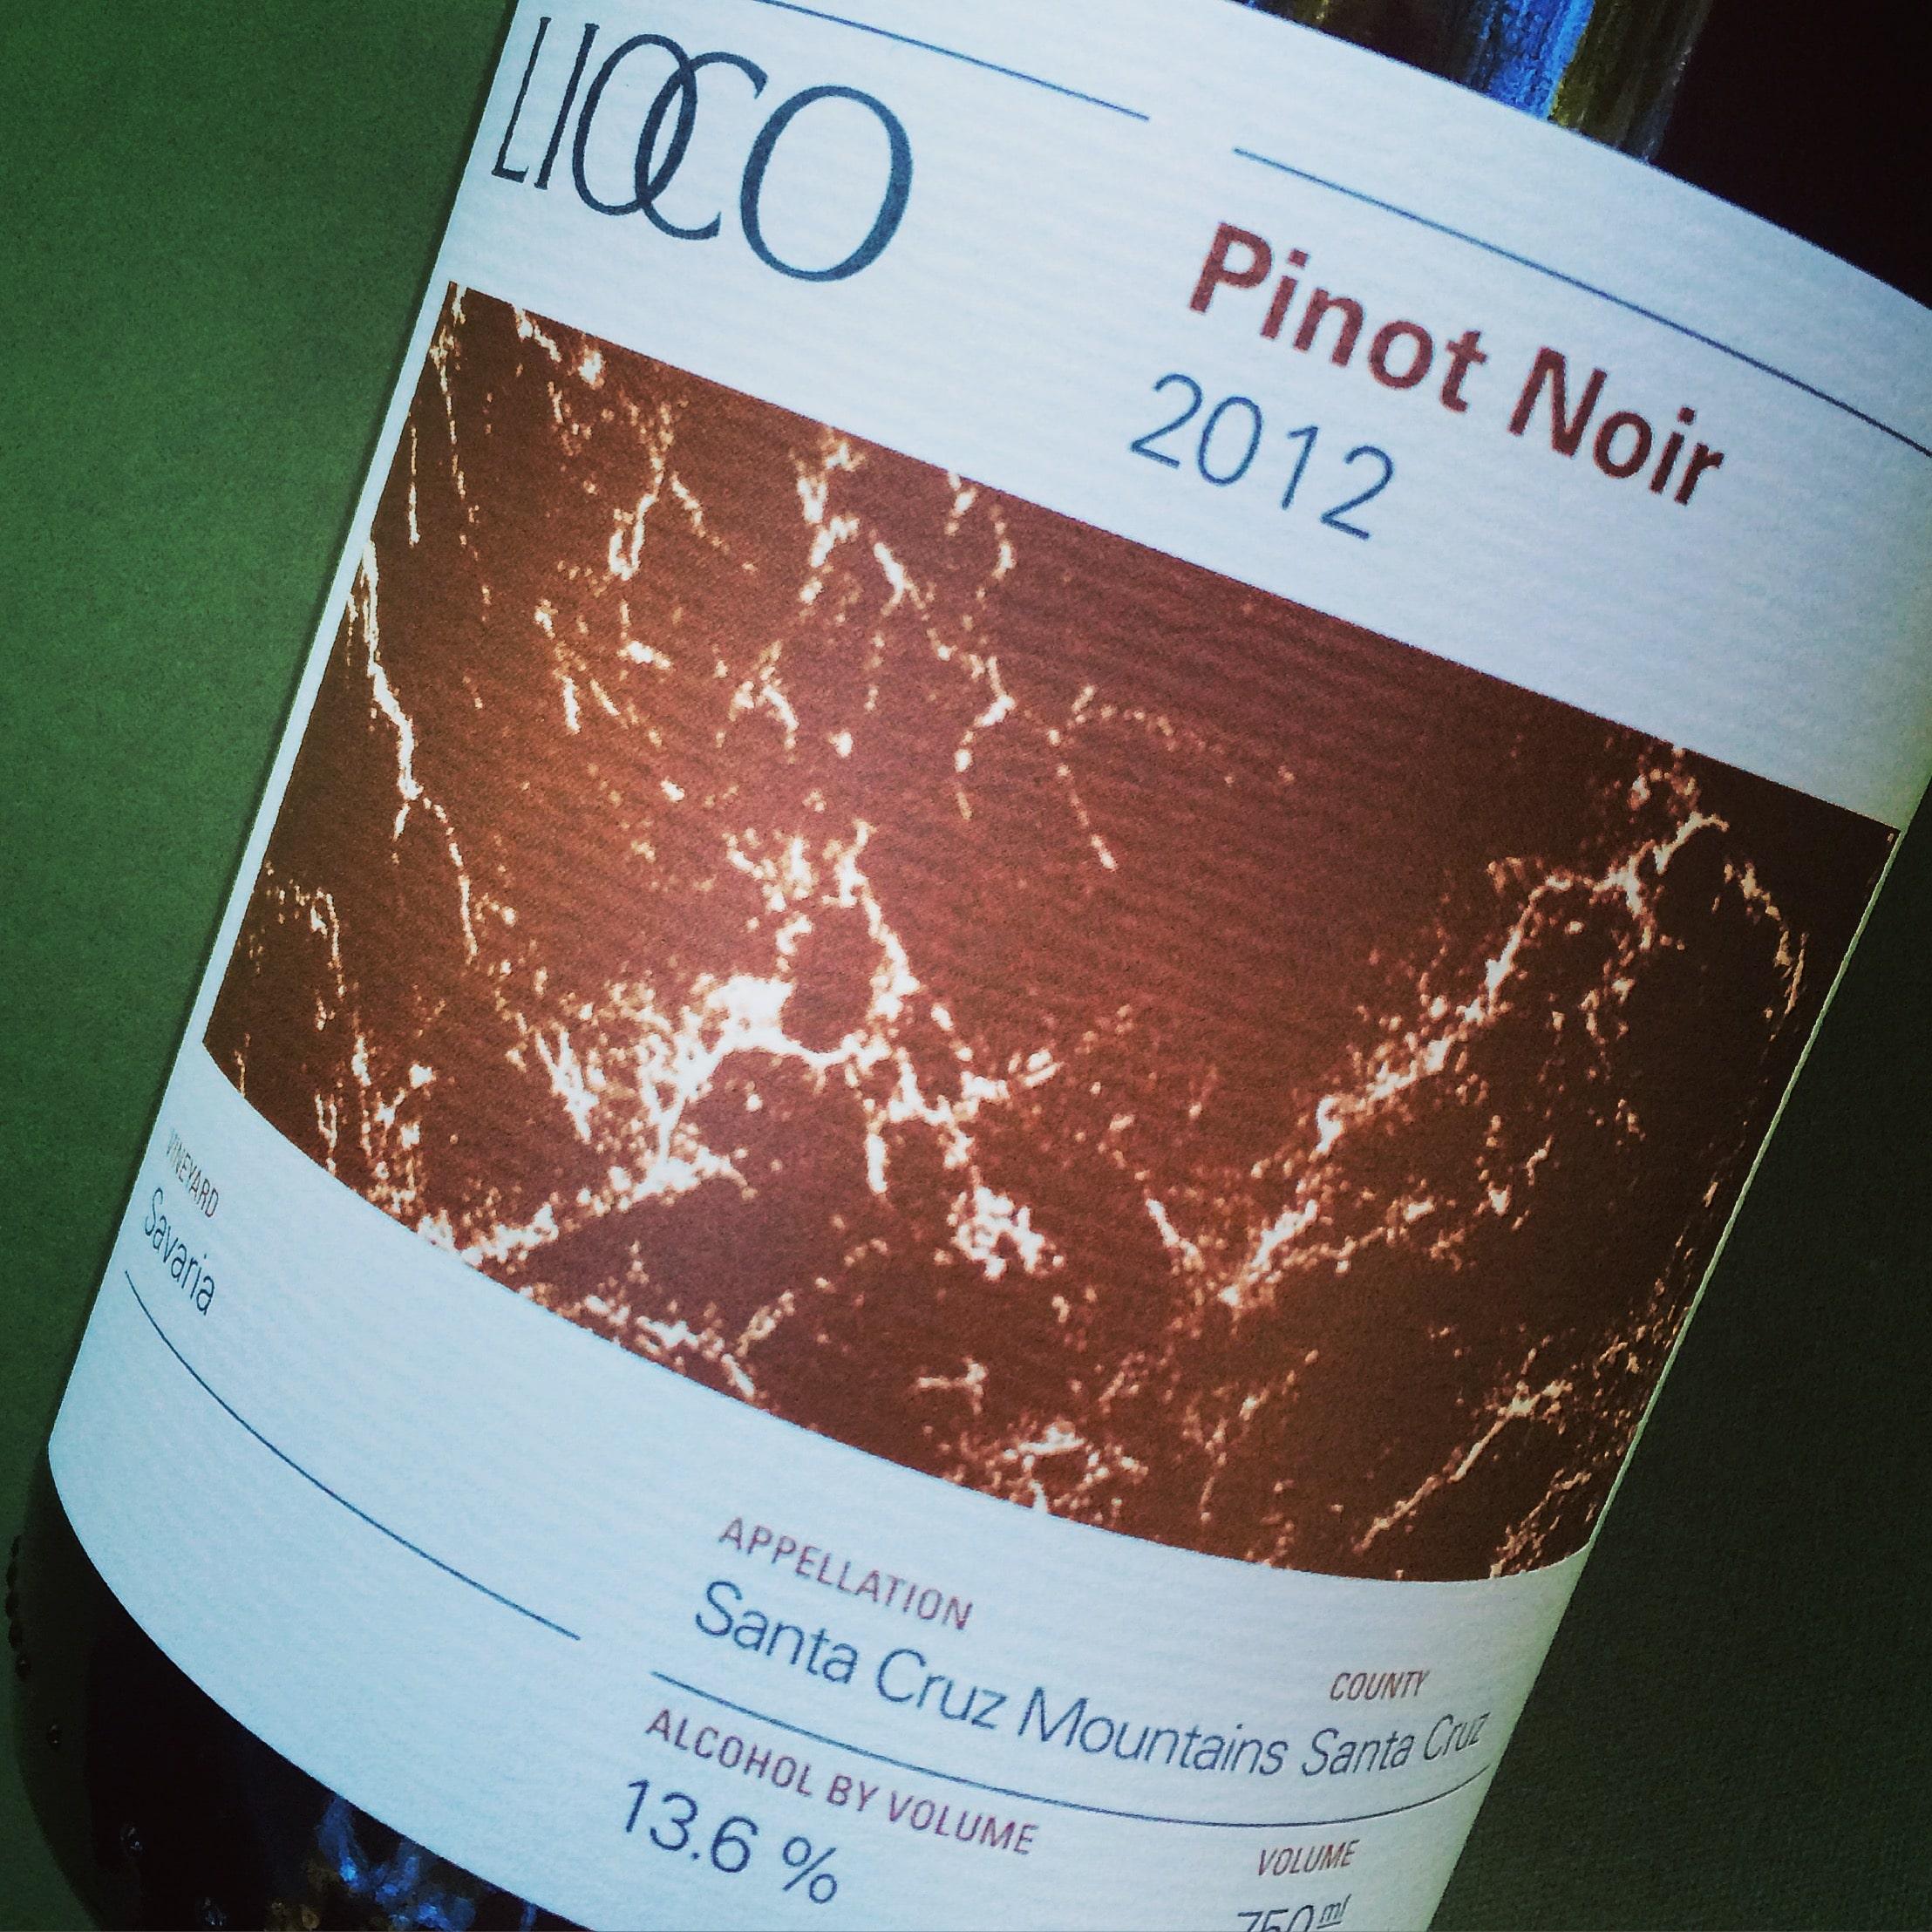 Lioco Savaria Vineyard Pinot Noir 2012